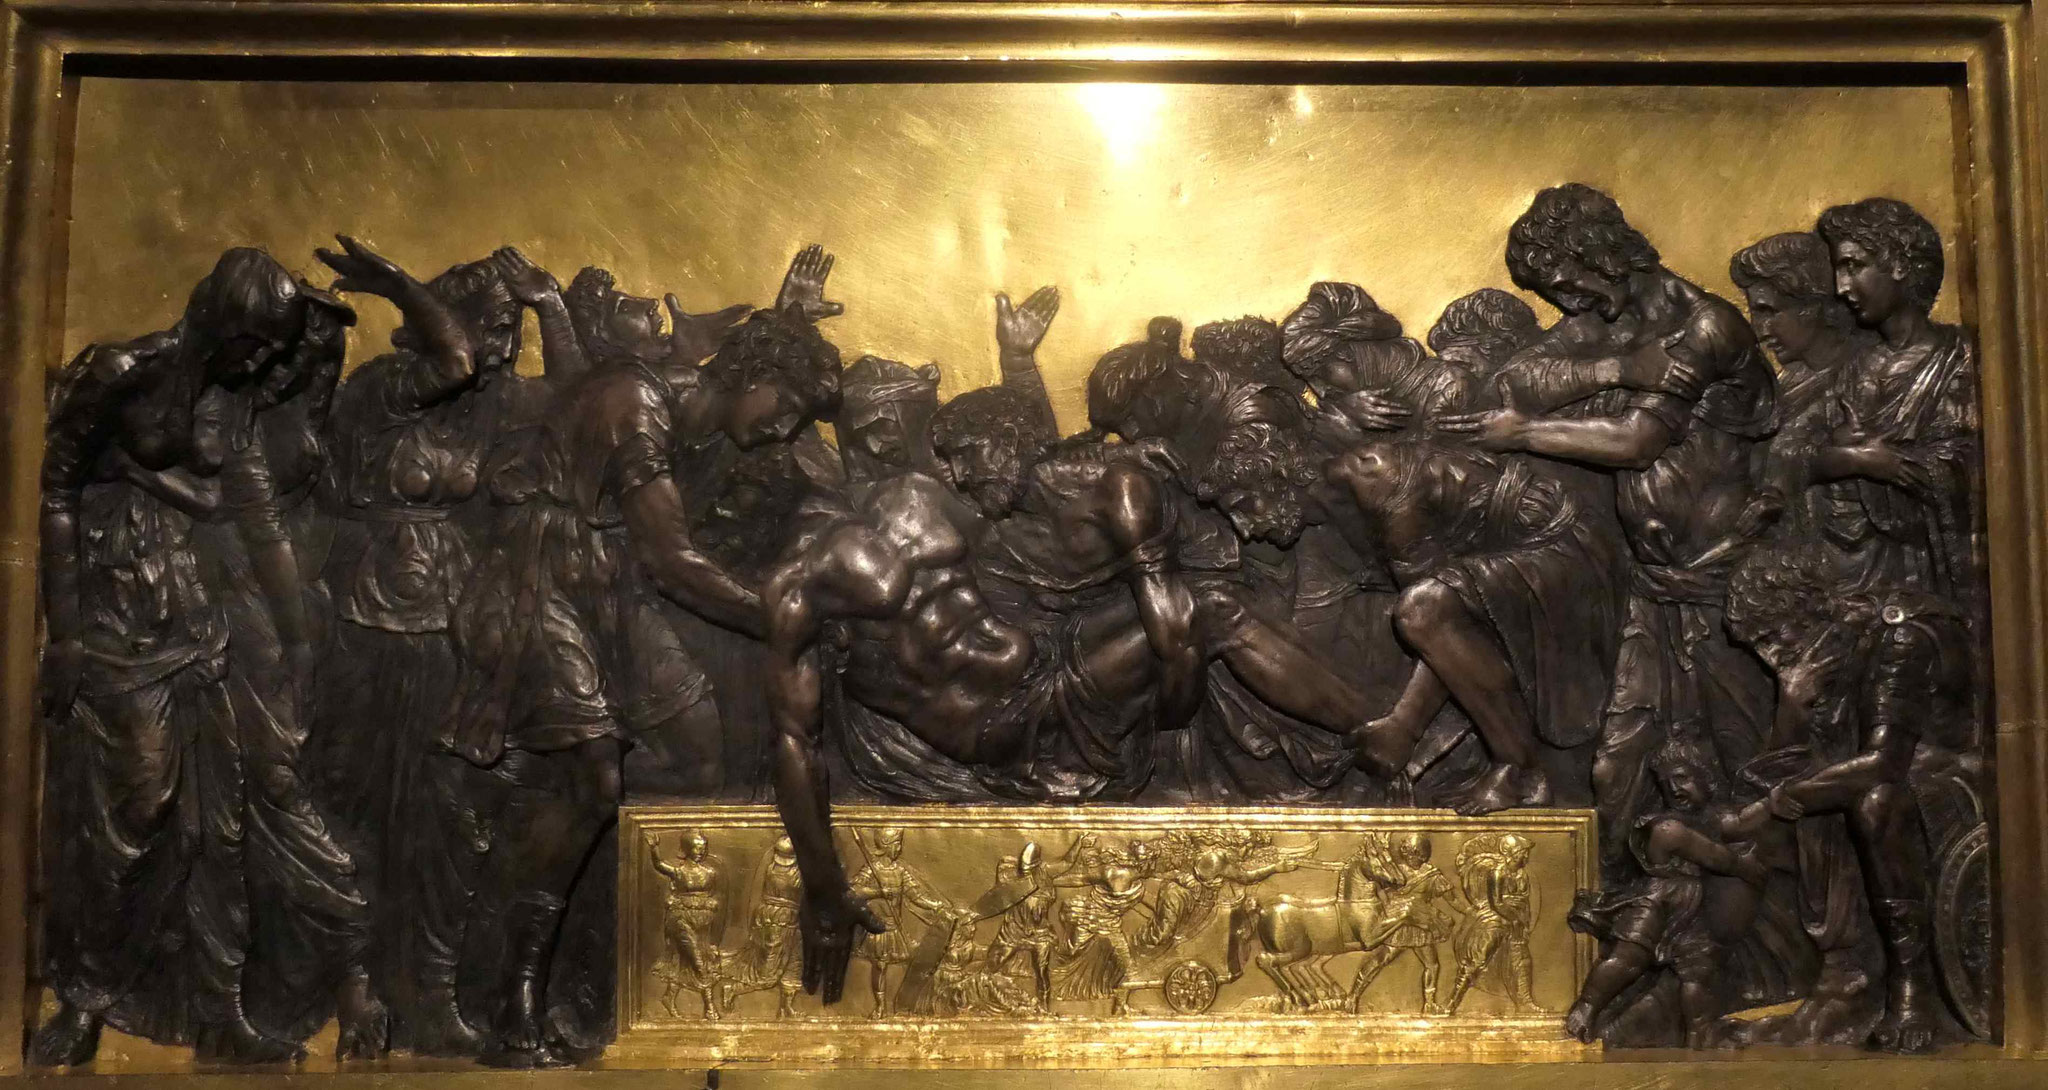 Andrea Mantegna, Die Grablegung Christi, um 1470/80